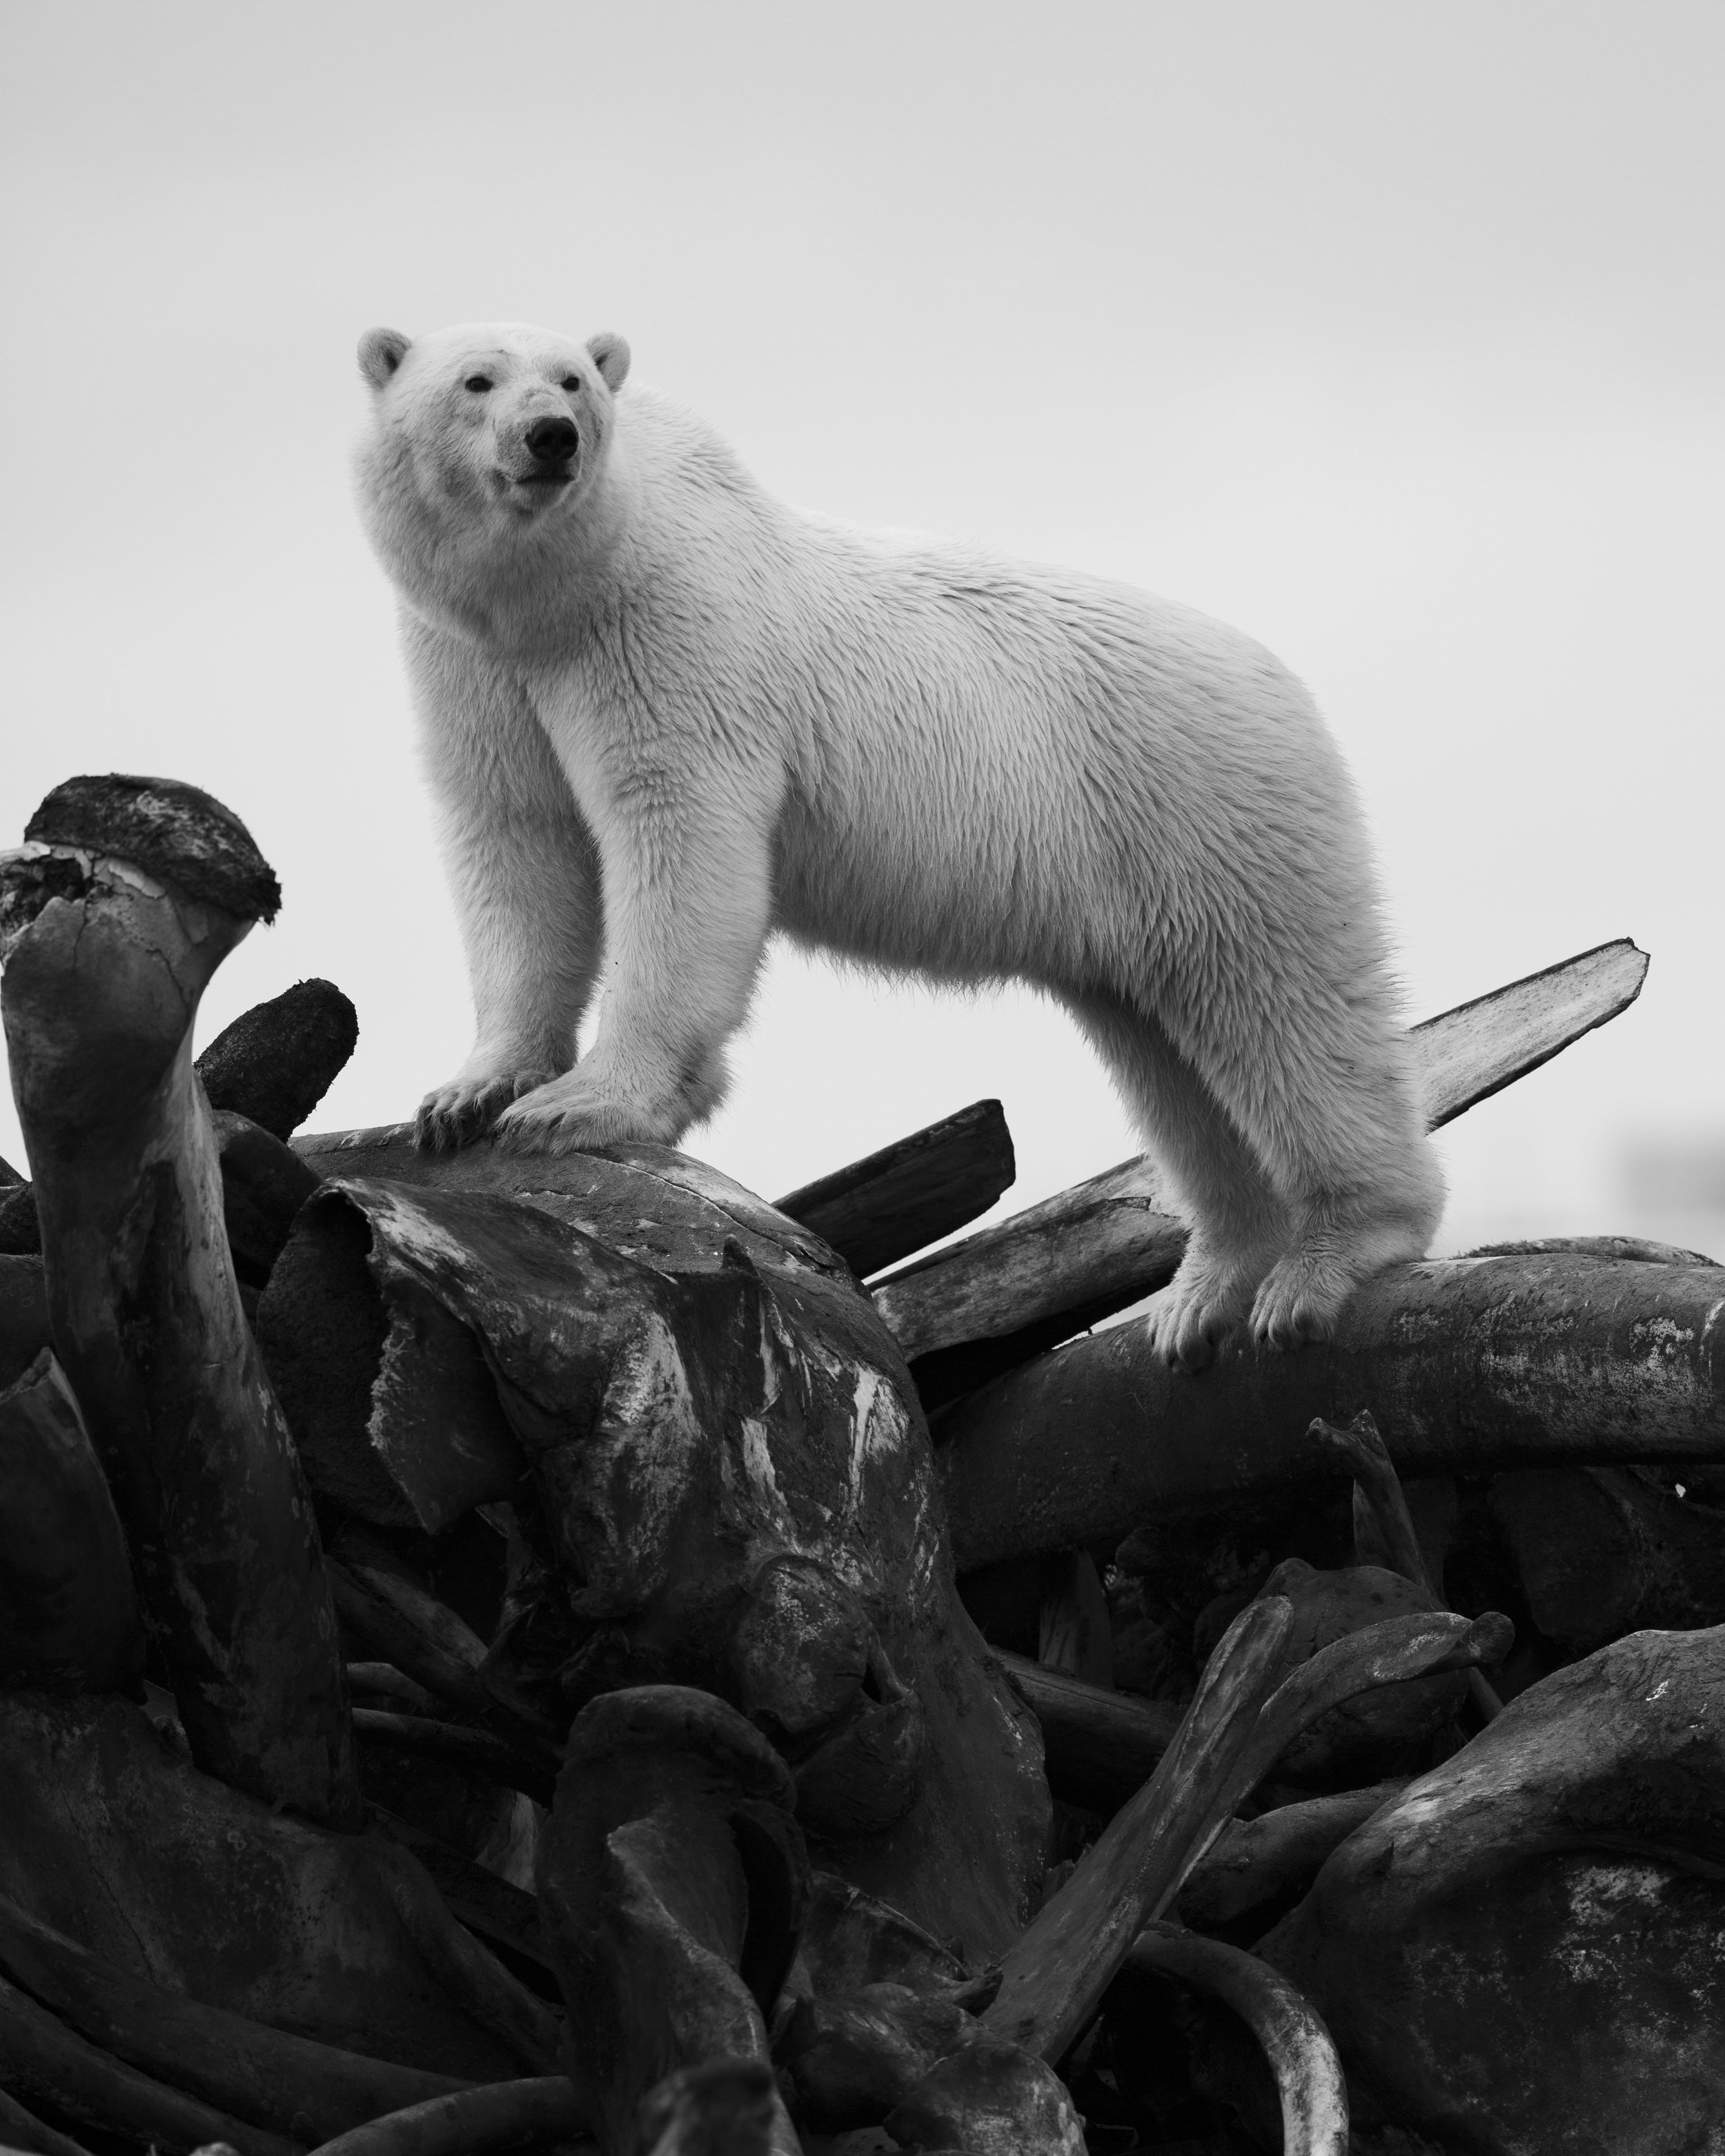 Adolescent Polar Bear on Whale Bones